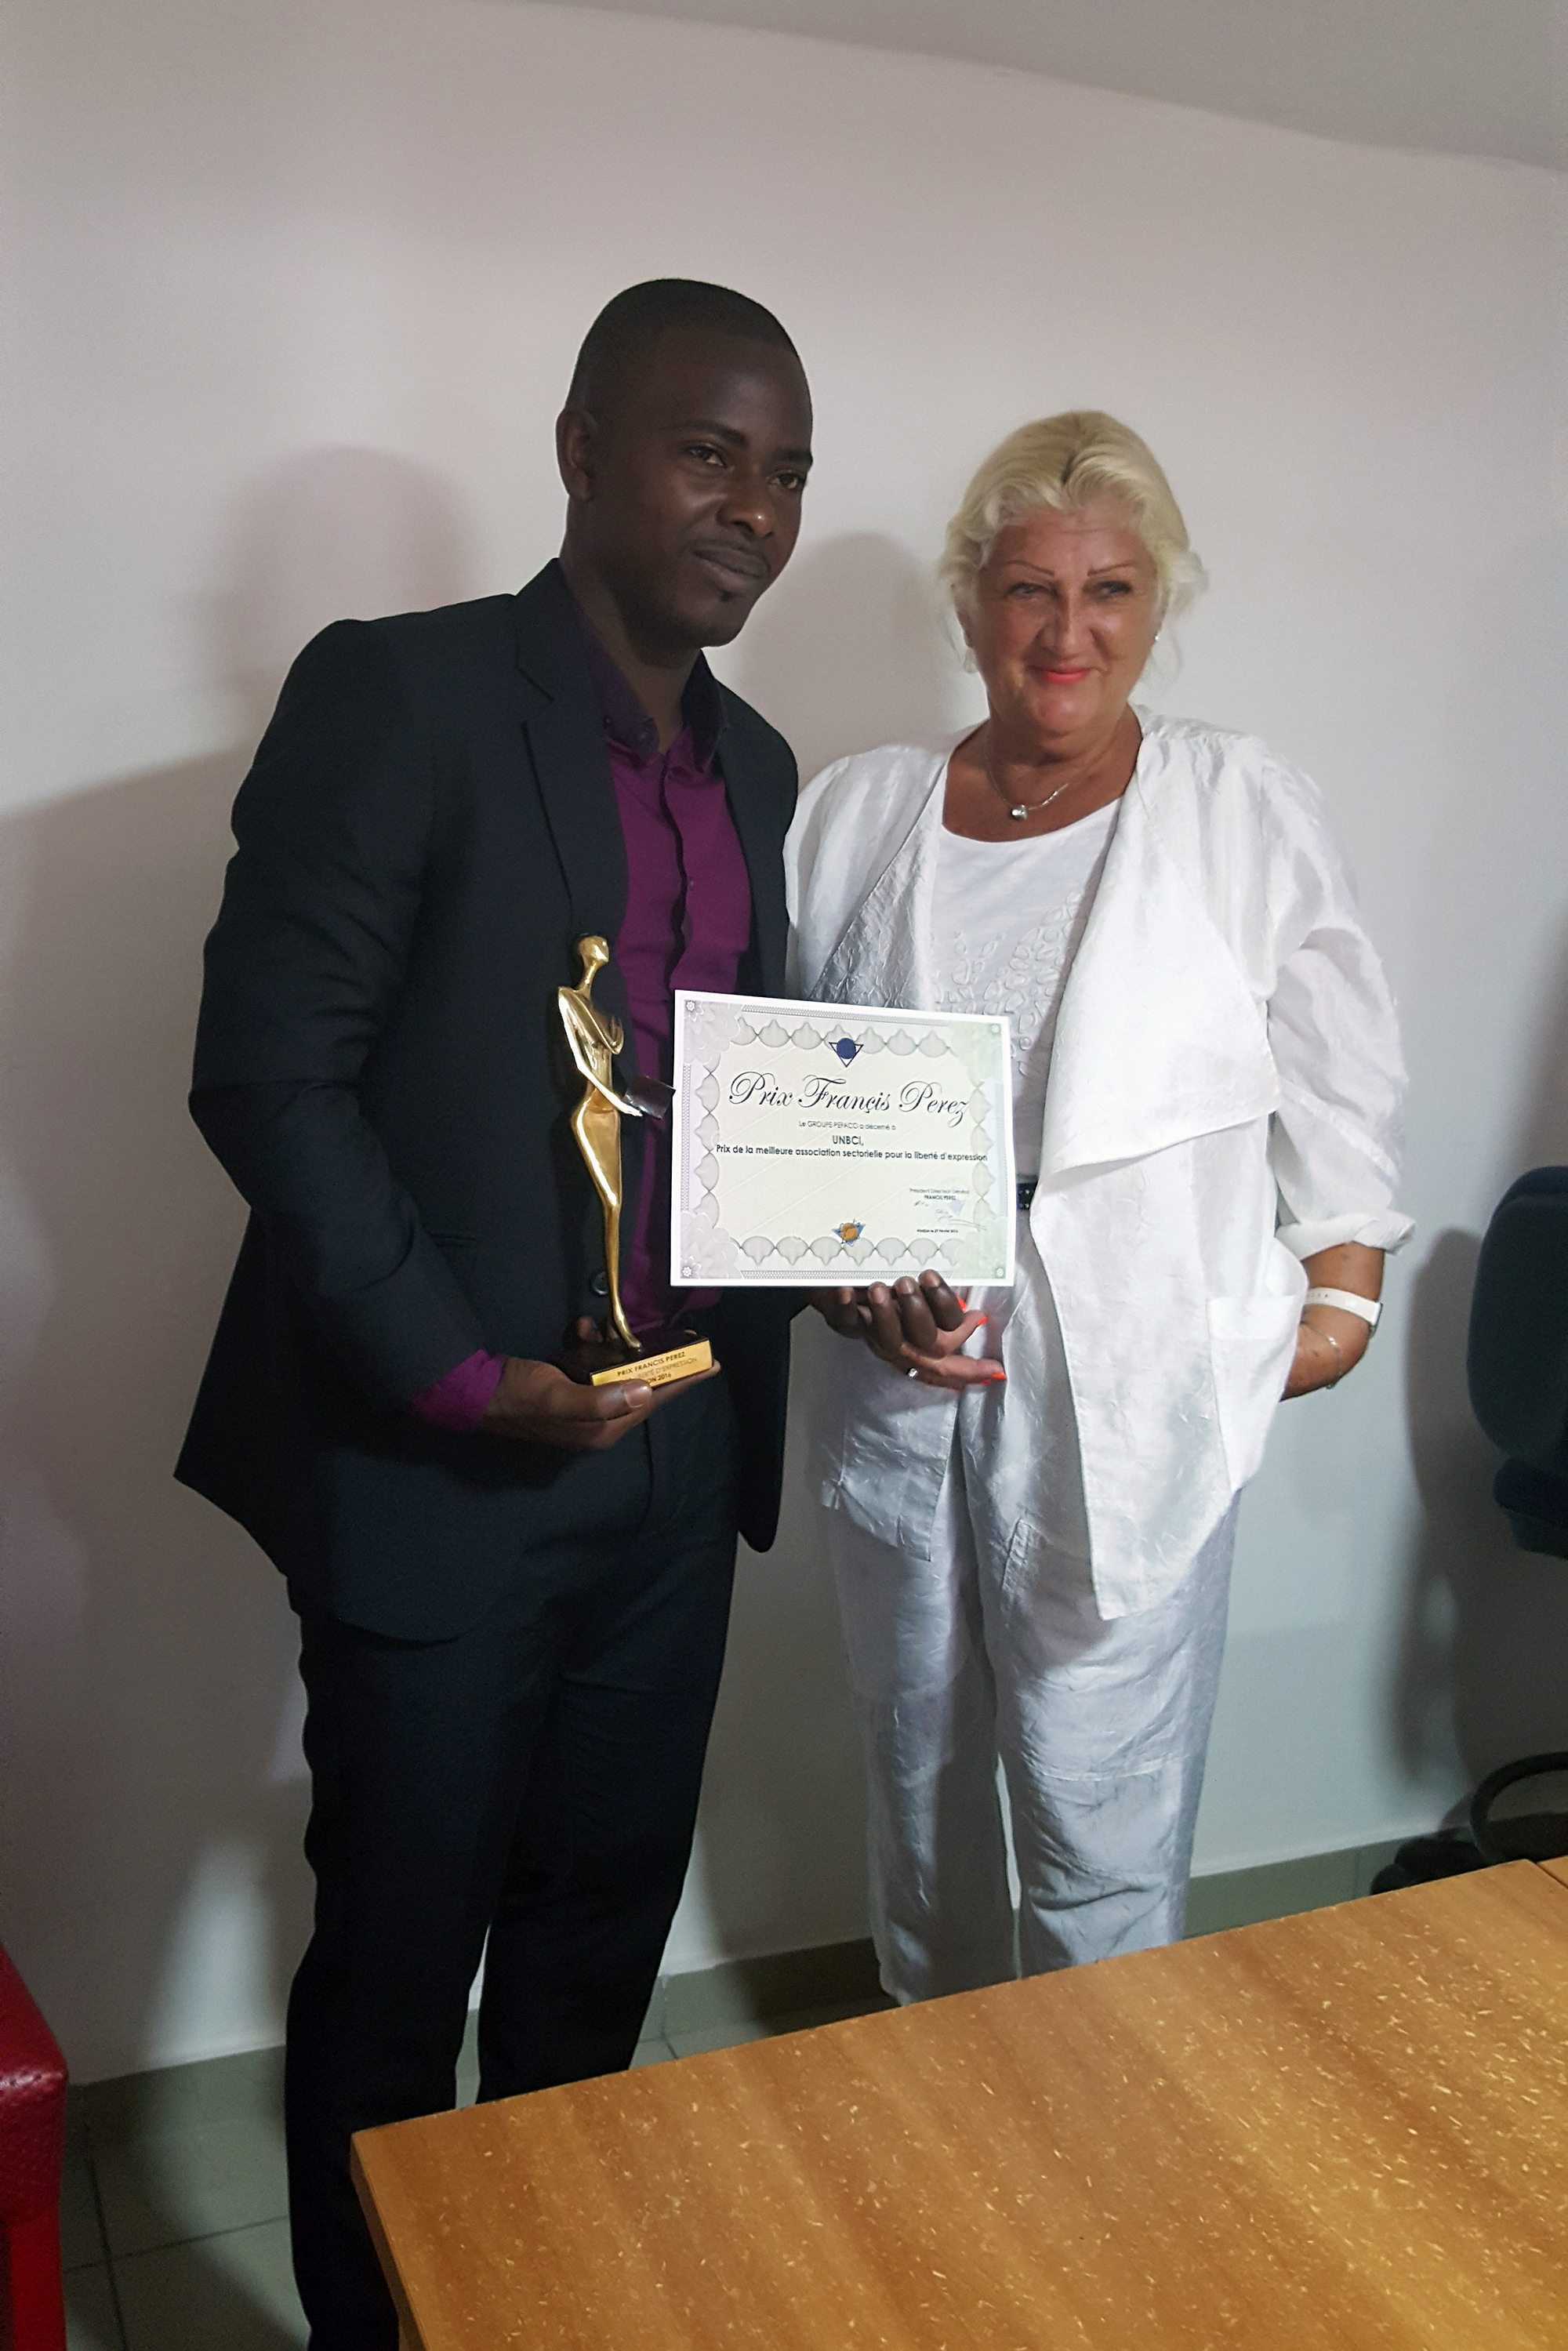 16-02-Lydia-Ludic-Côte-dIvoire-Abidjan-CSR-Social-Prix-Francis-Perez-Liberté-Expression (4)